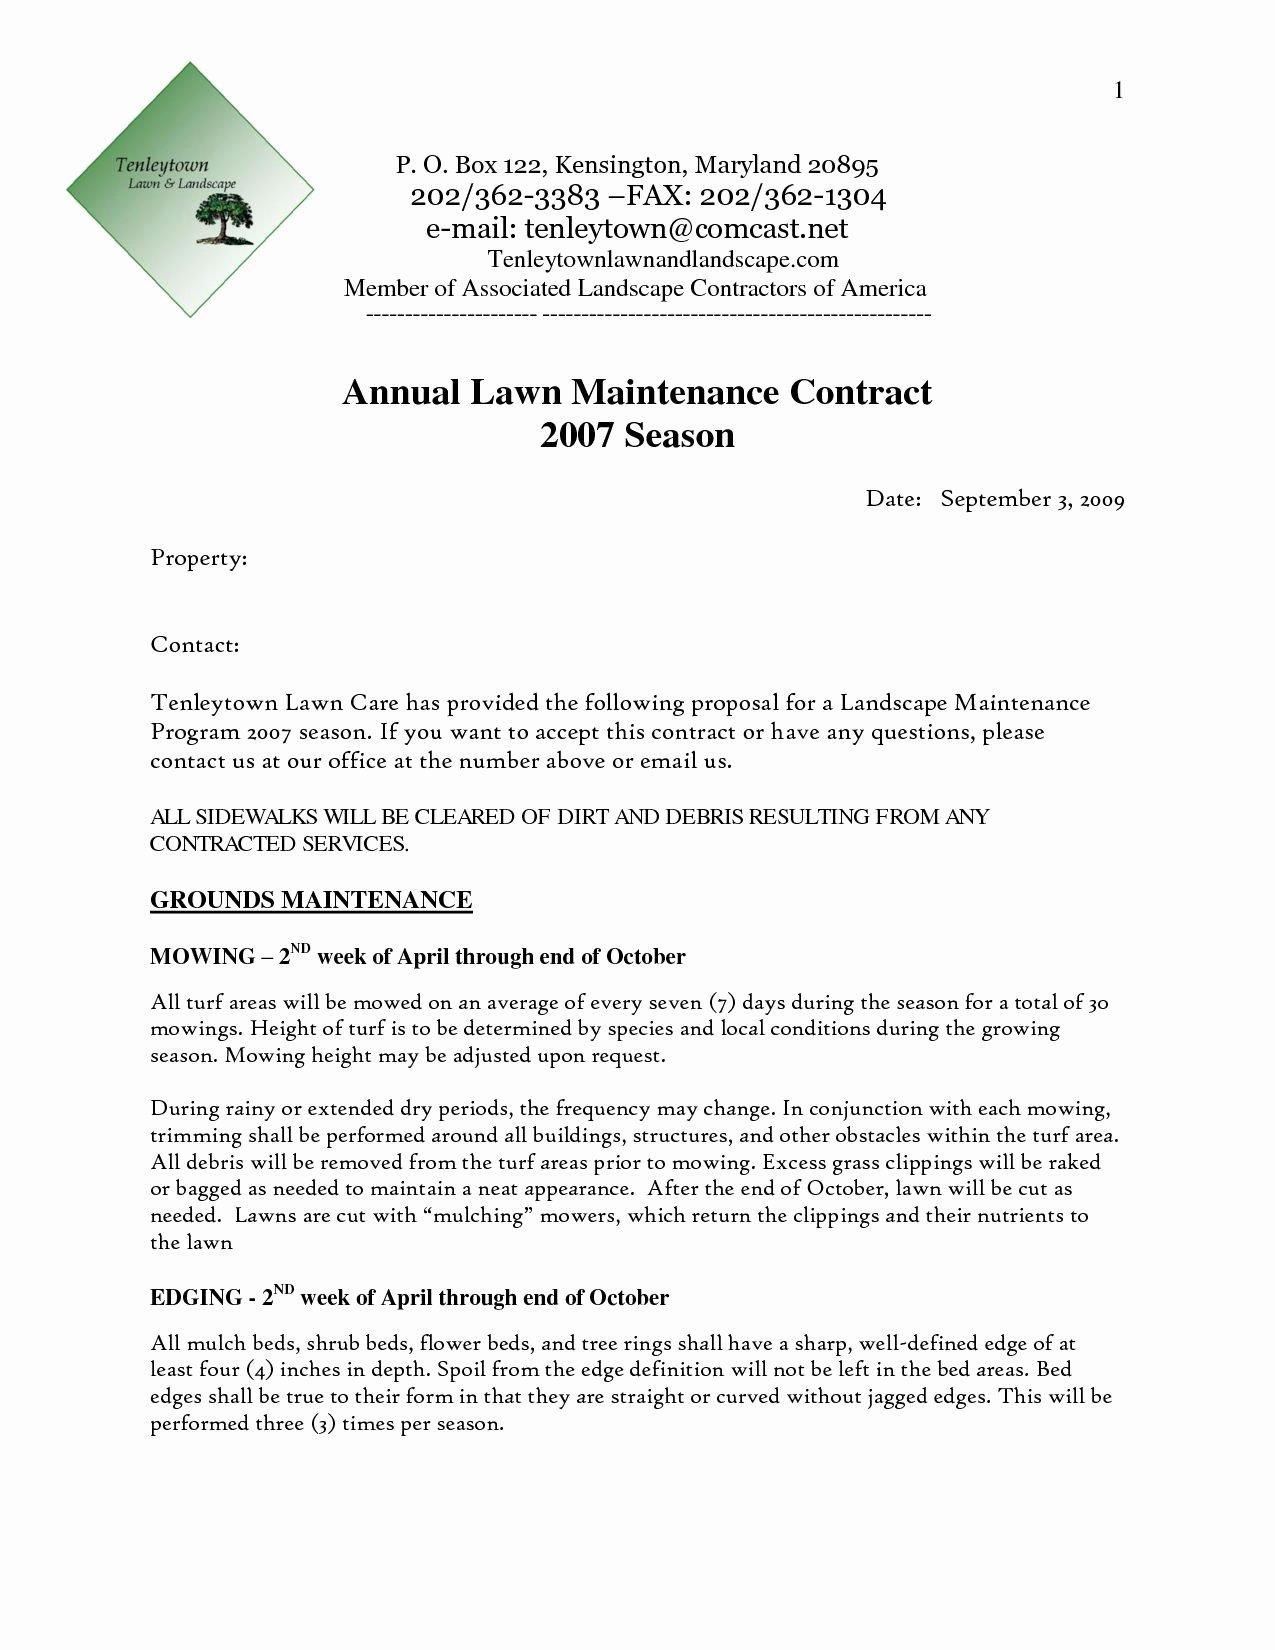 landscaping bid templates anuvrat info lawn care job bids xcyyxh